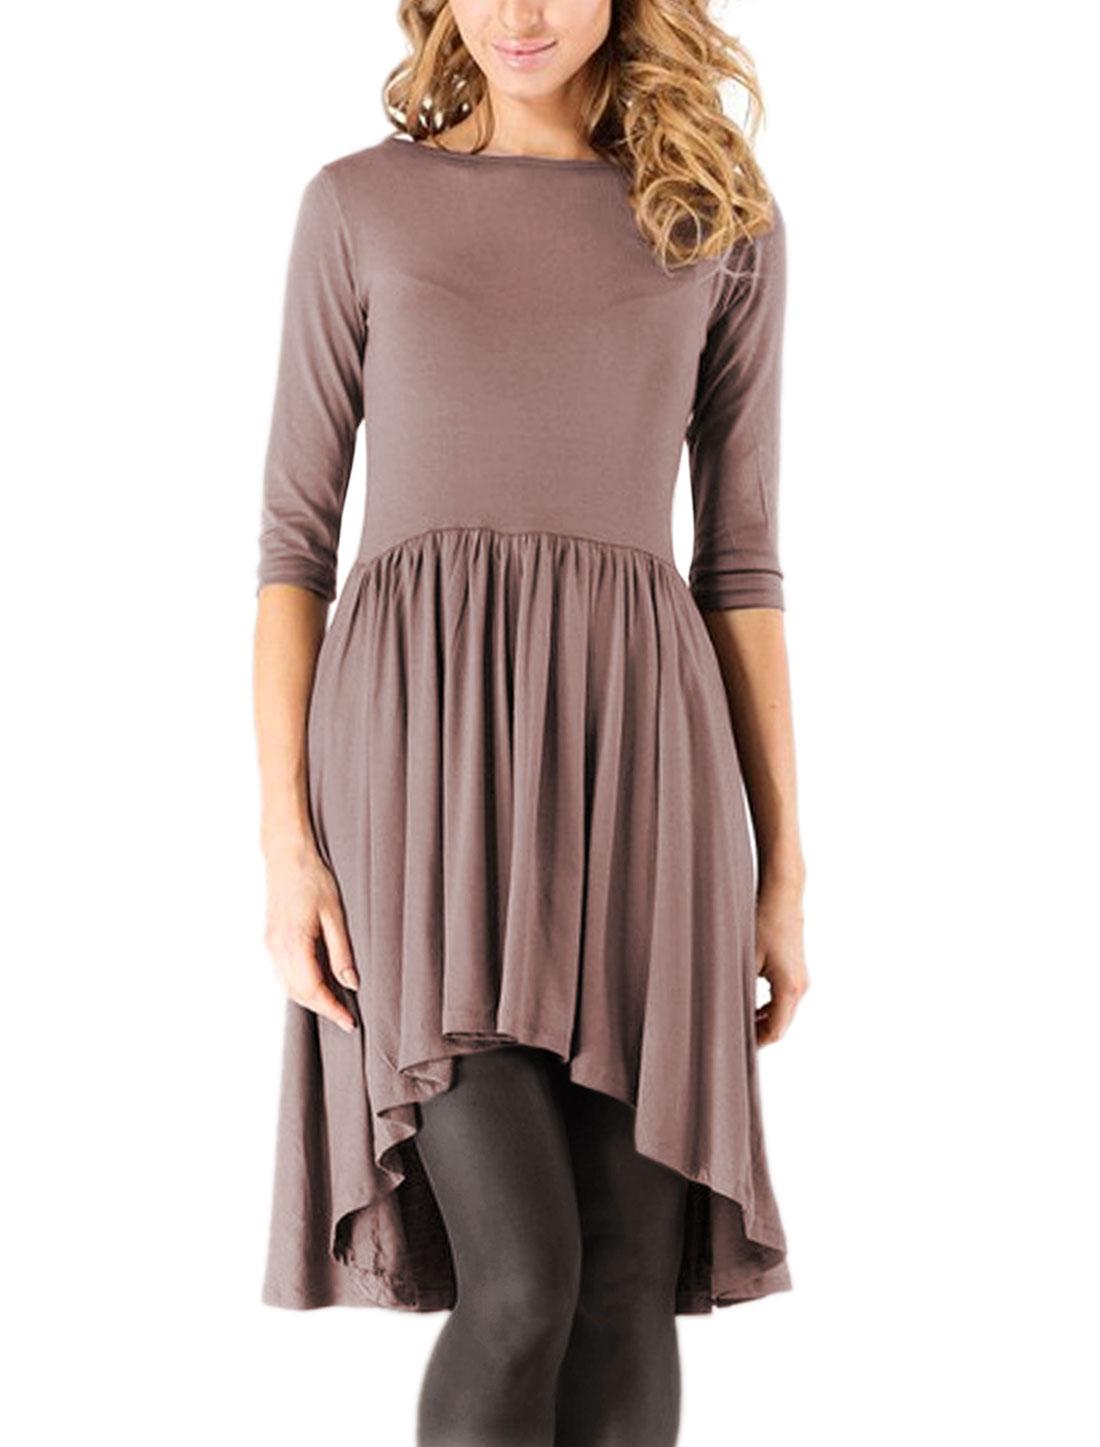 Women 3/4 Sleeves Pleated Asymmetric Hem Tunic Top Purple M